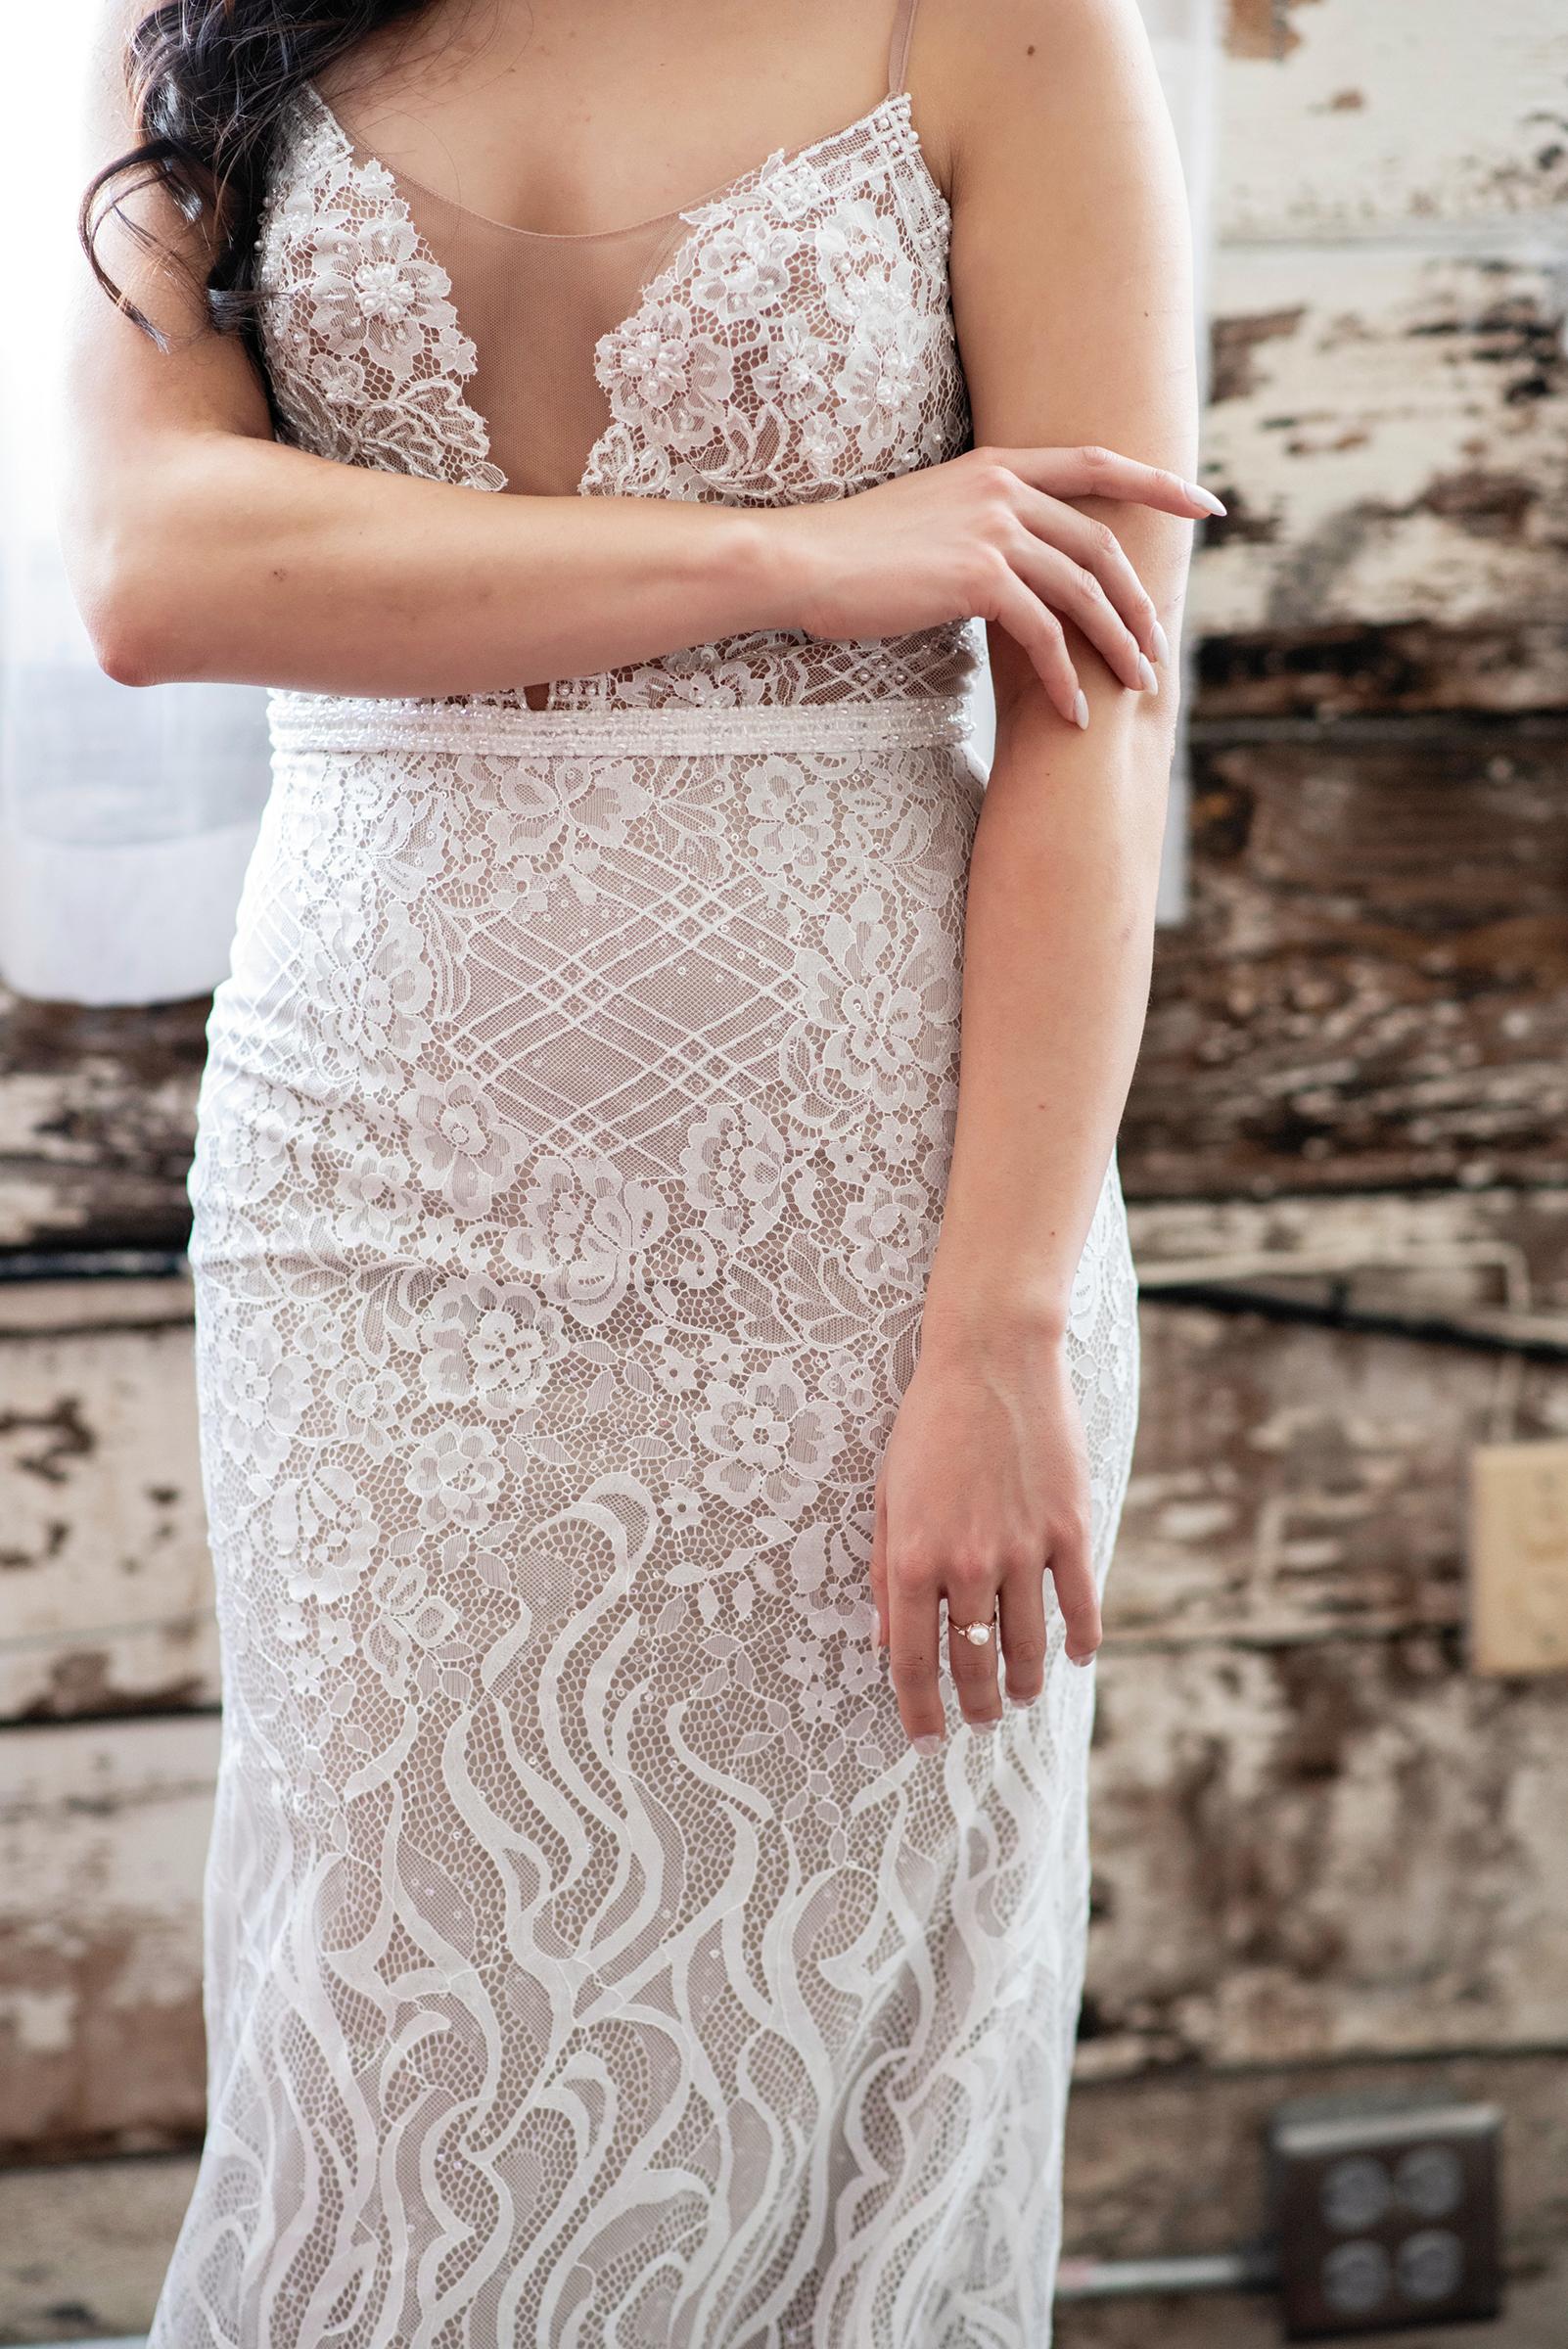 Stephanie-Third Dress Details-5.jpg